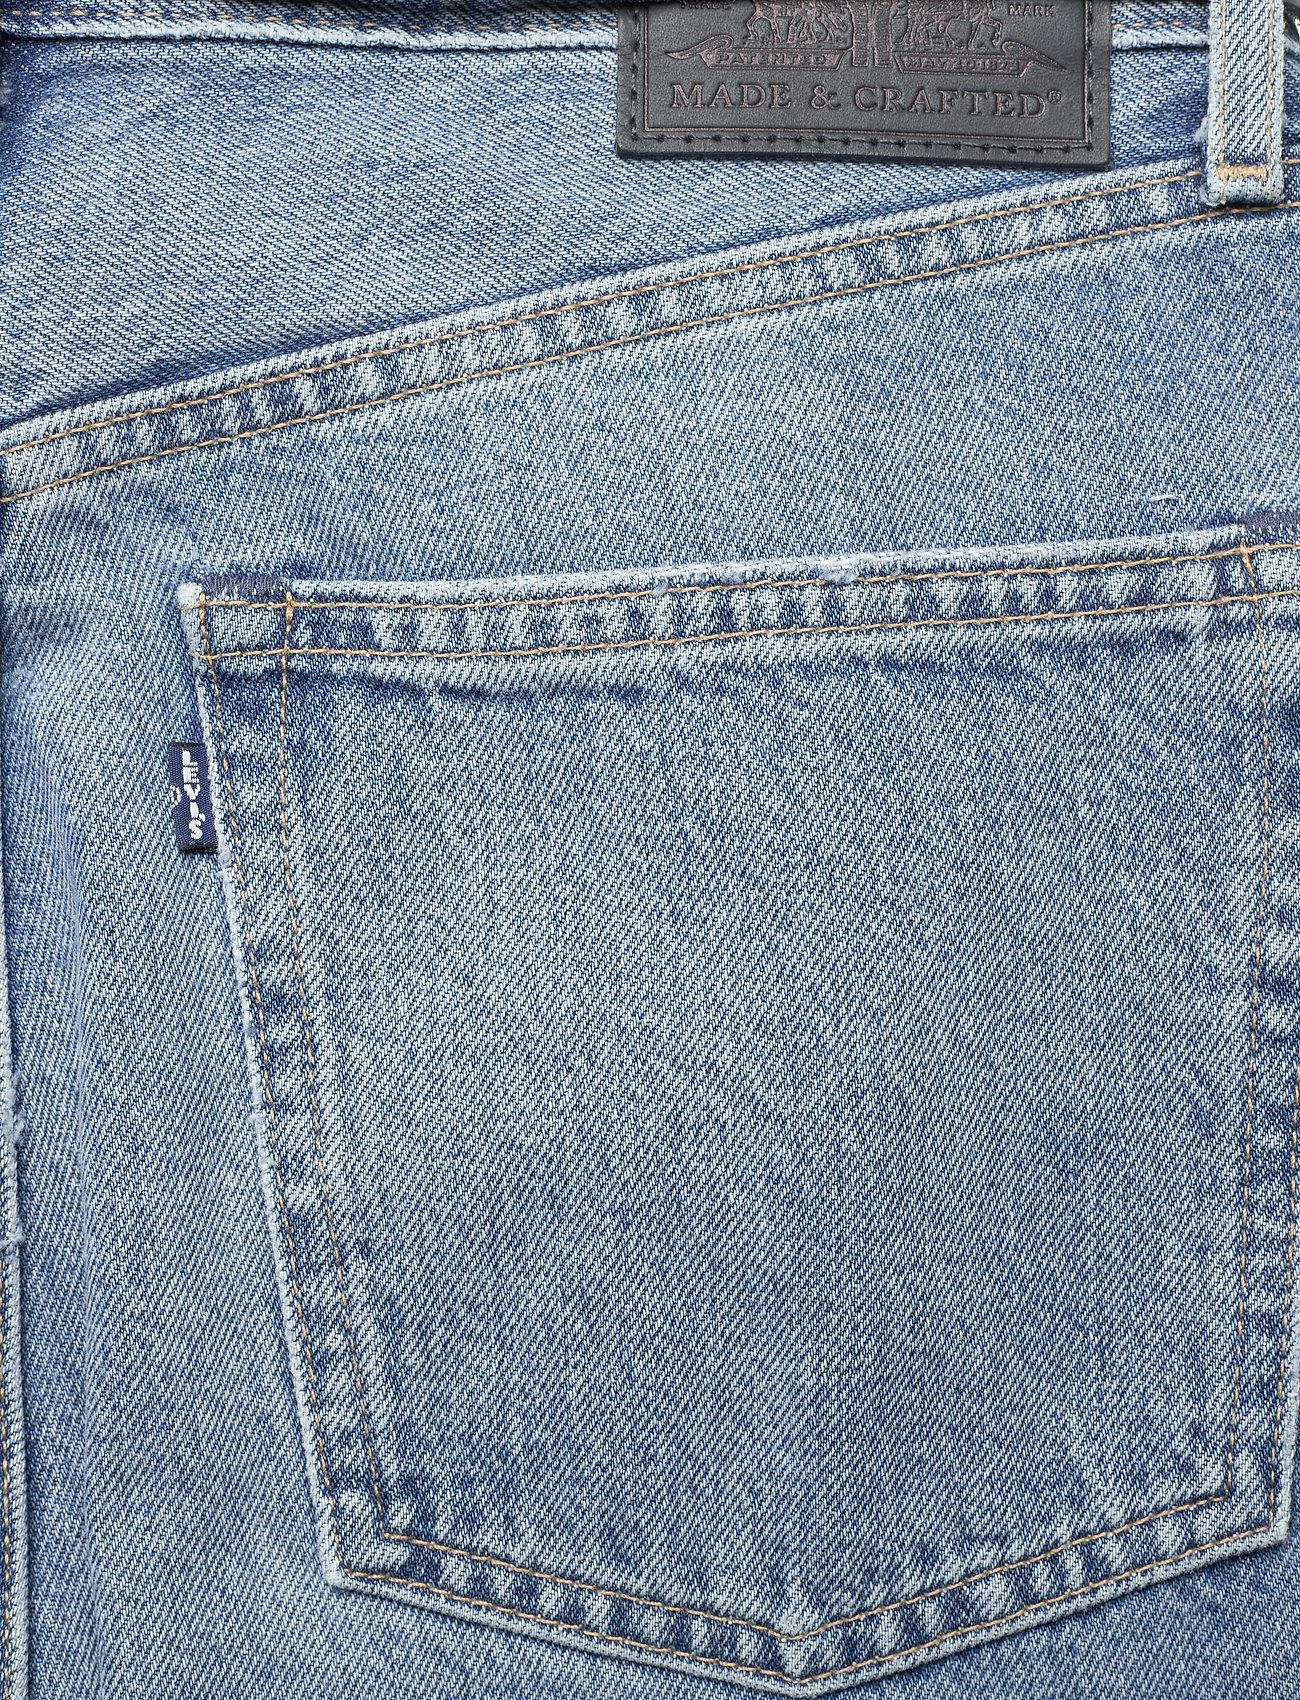 Levi's Made & Crafted - LMC BARREL LMC PALM BLUES - straight regular - med indigo - flat finish - 5